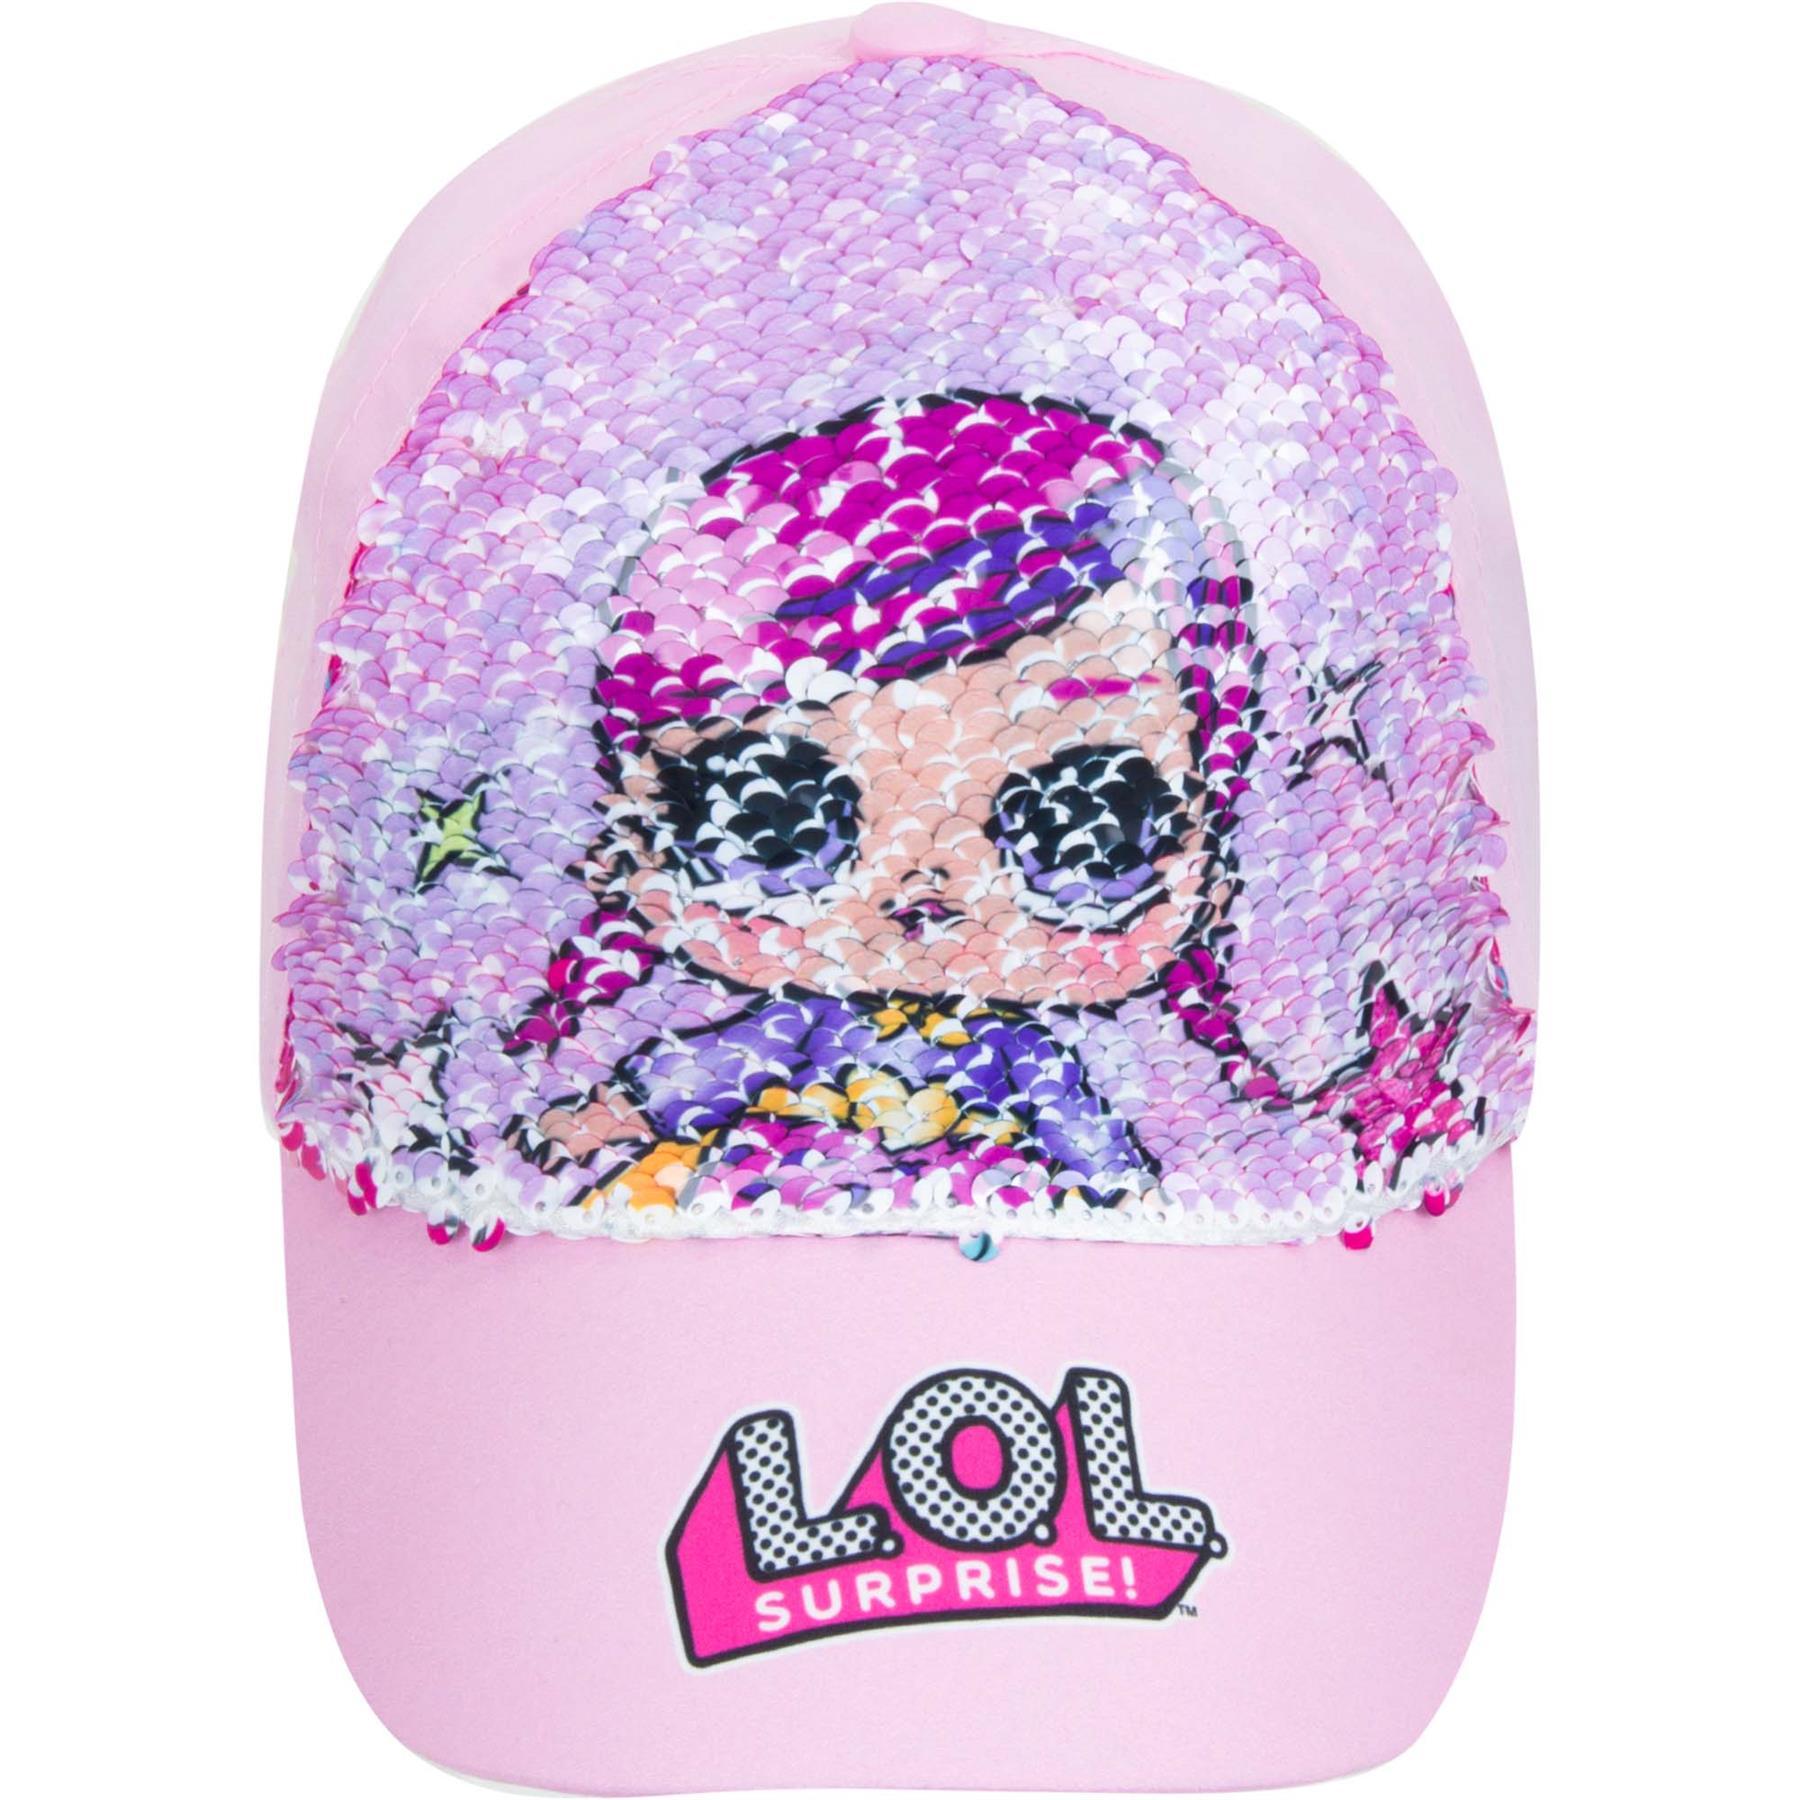 Girls-Cap-LOL-Surprise-Baseball-Reversible-Pink-Sequin-Hat-Sun-Summer thumbnail 3